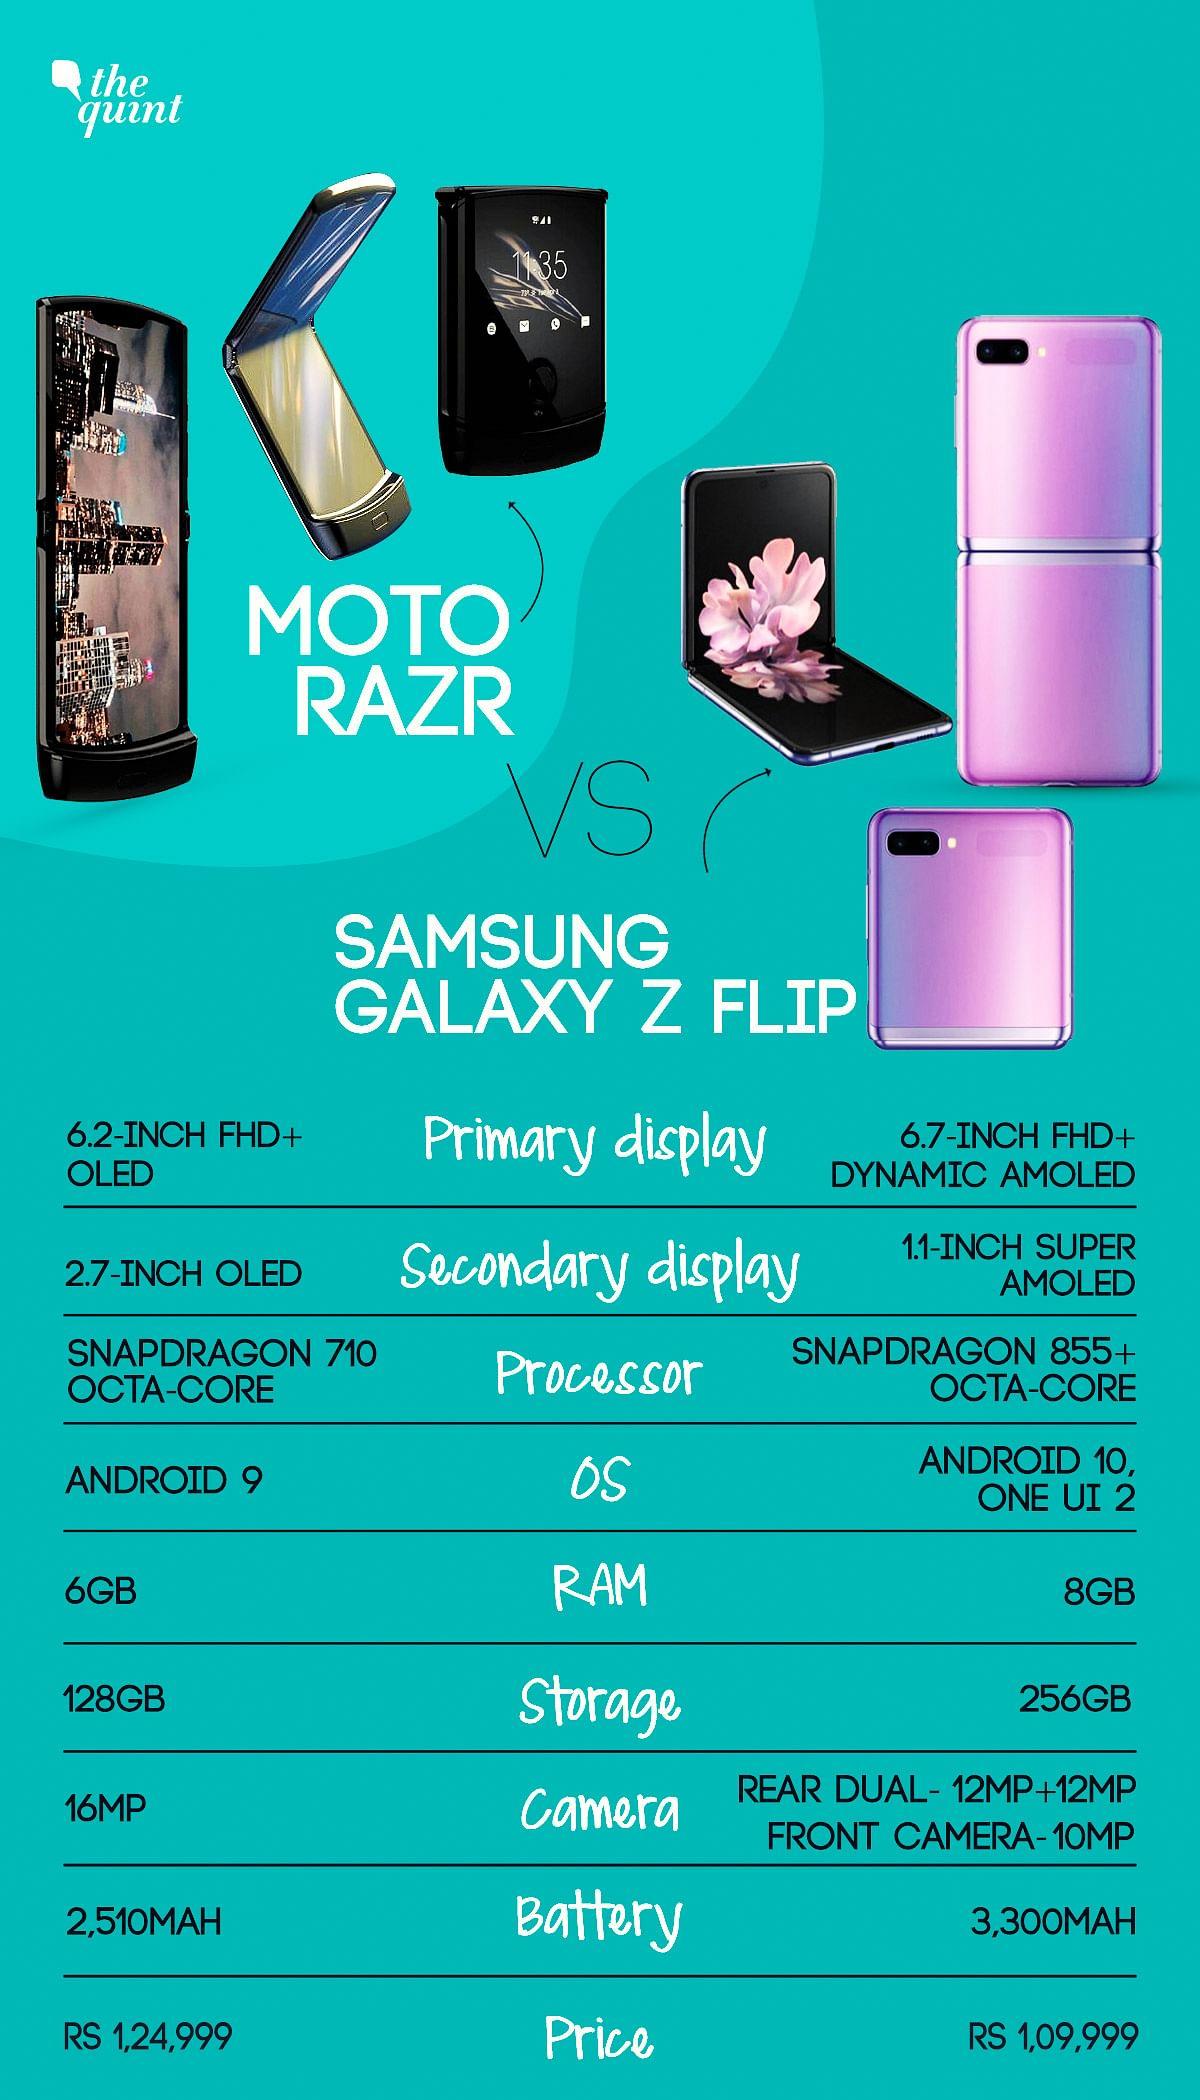 Samsung Galaxy Z Flip Vs Moto Razr: The Better Foldable Phone?